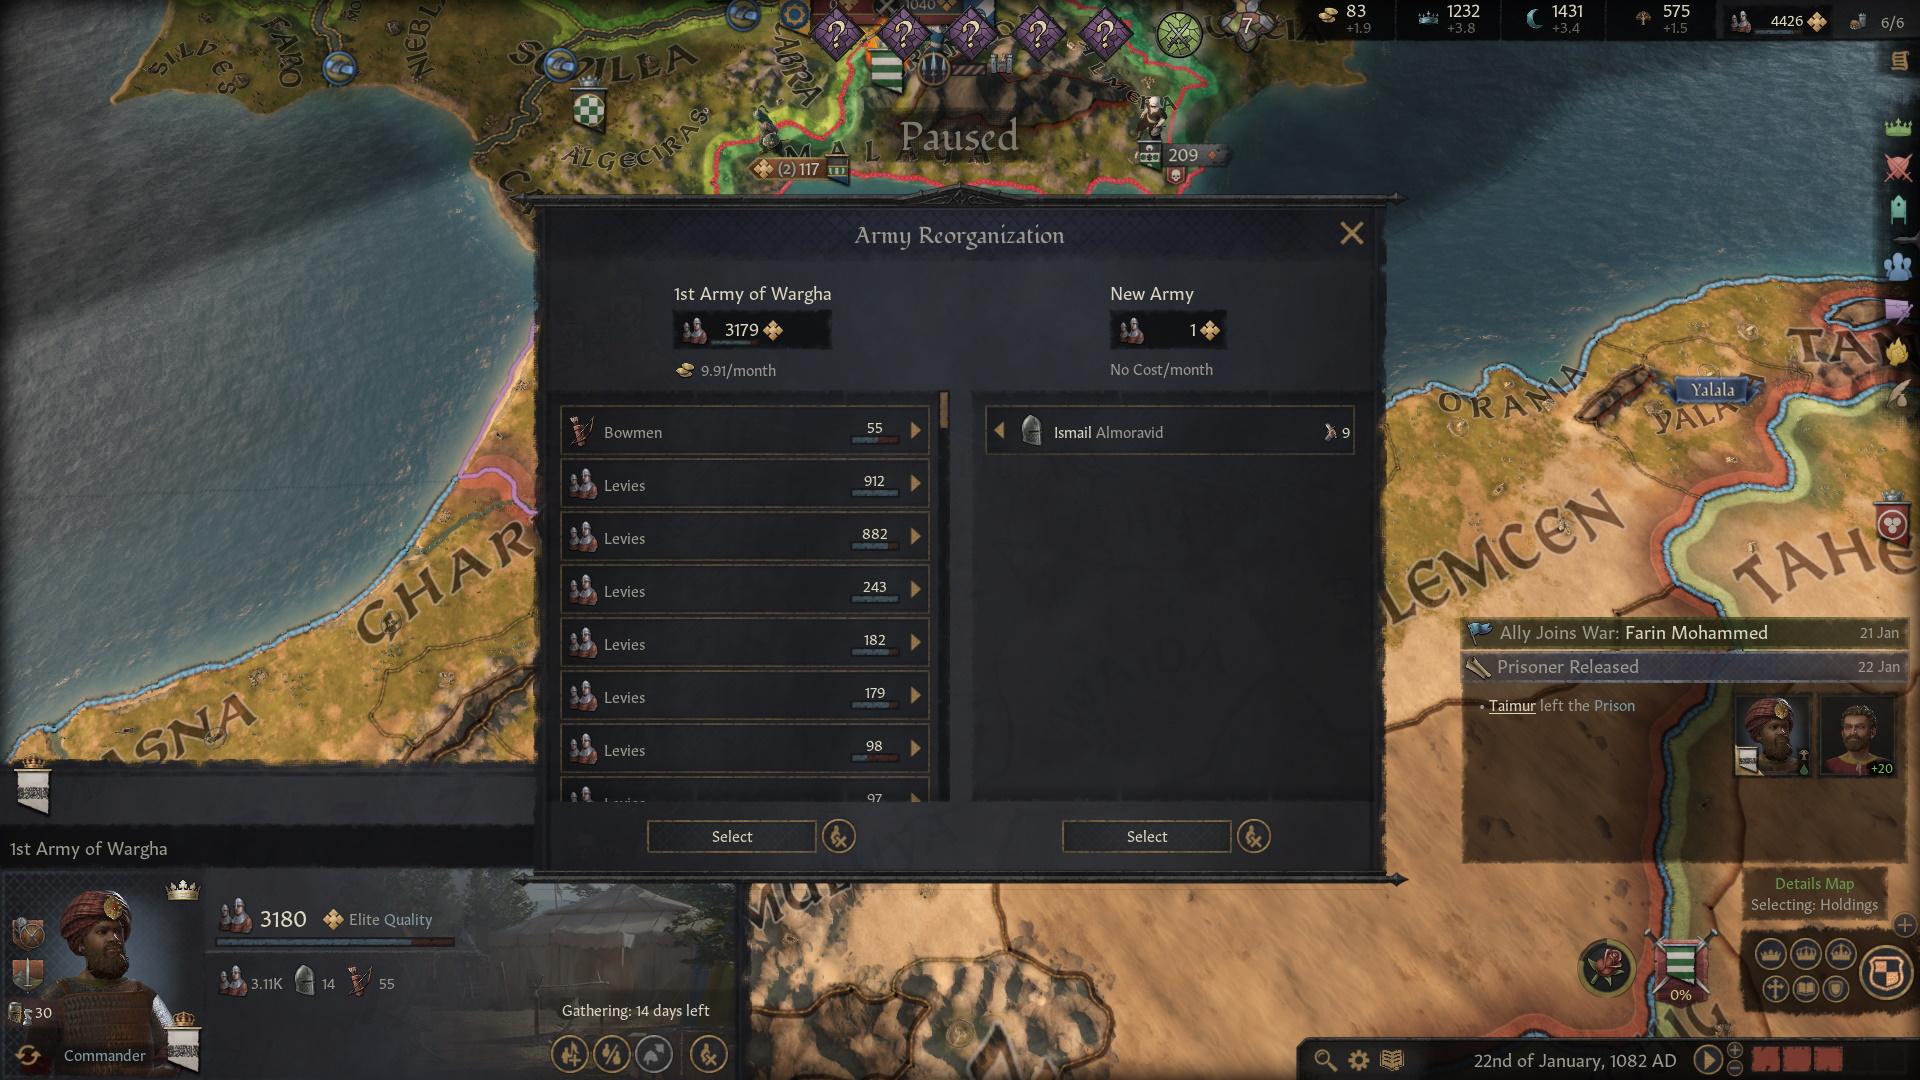 Reorganising your army in Crusader Kings 3